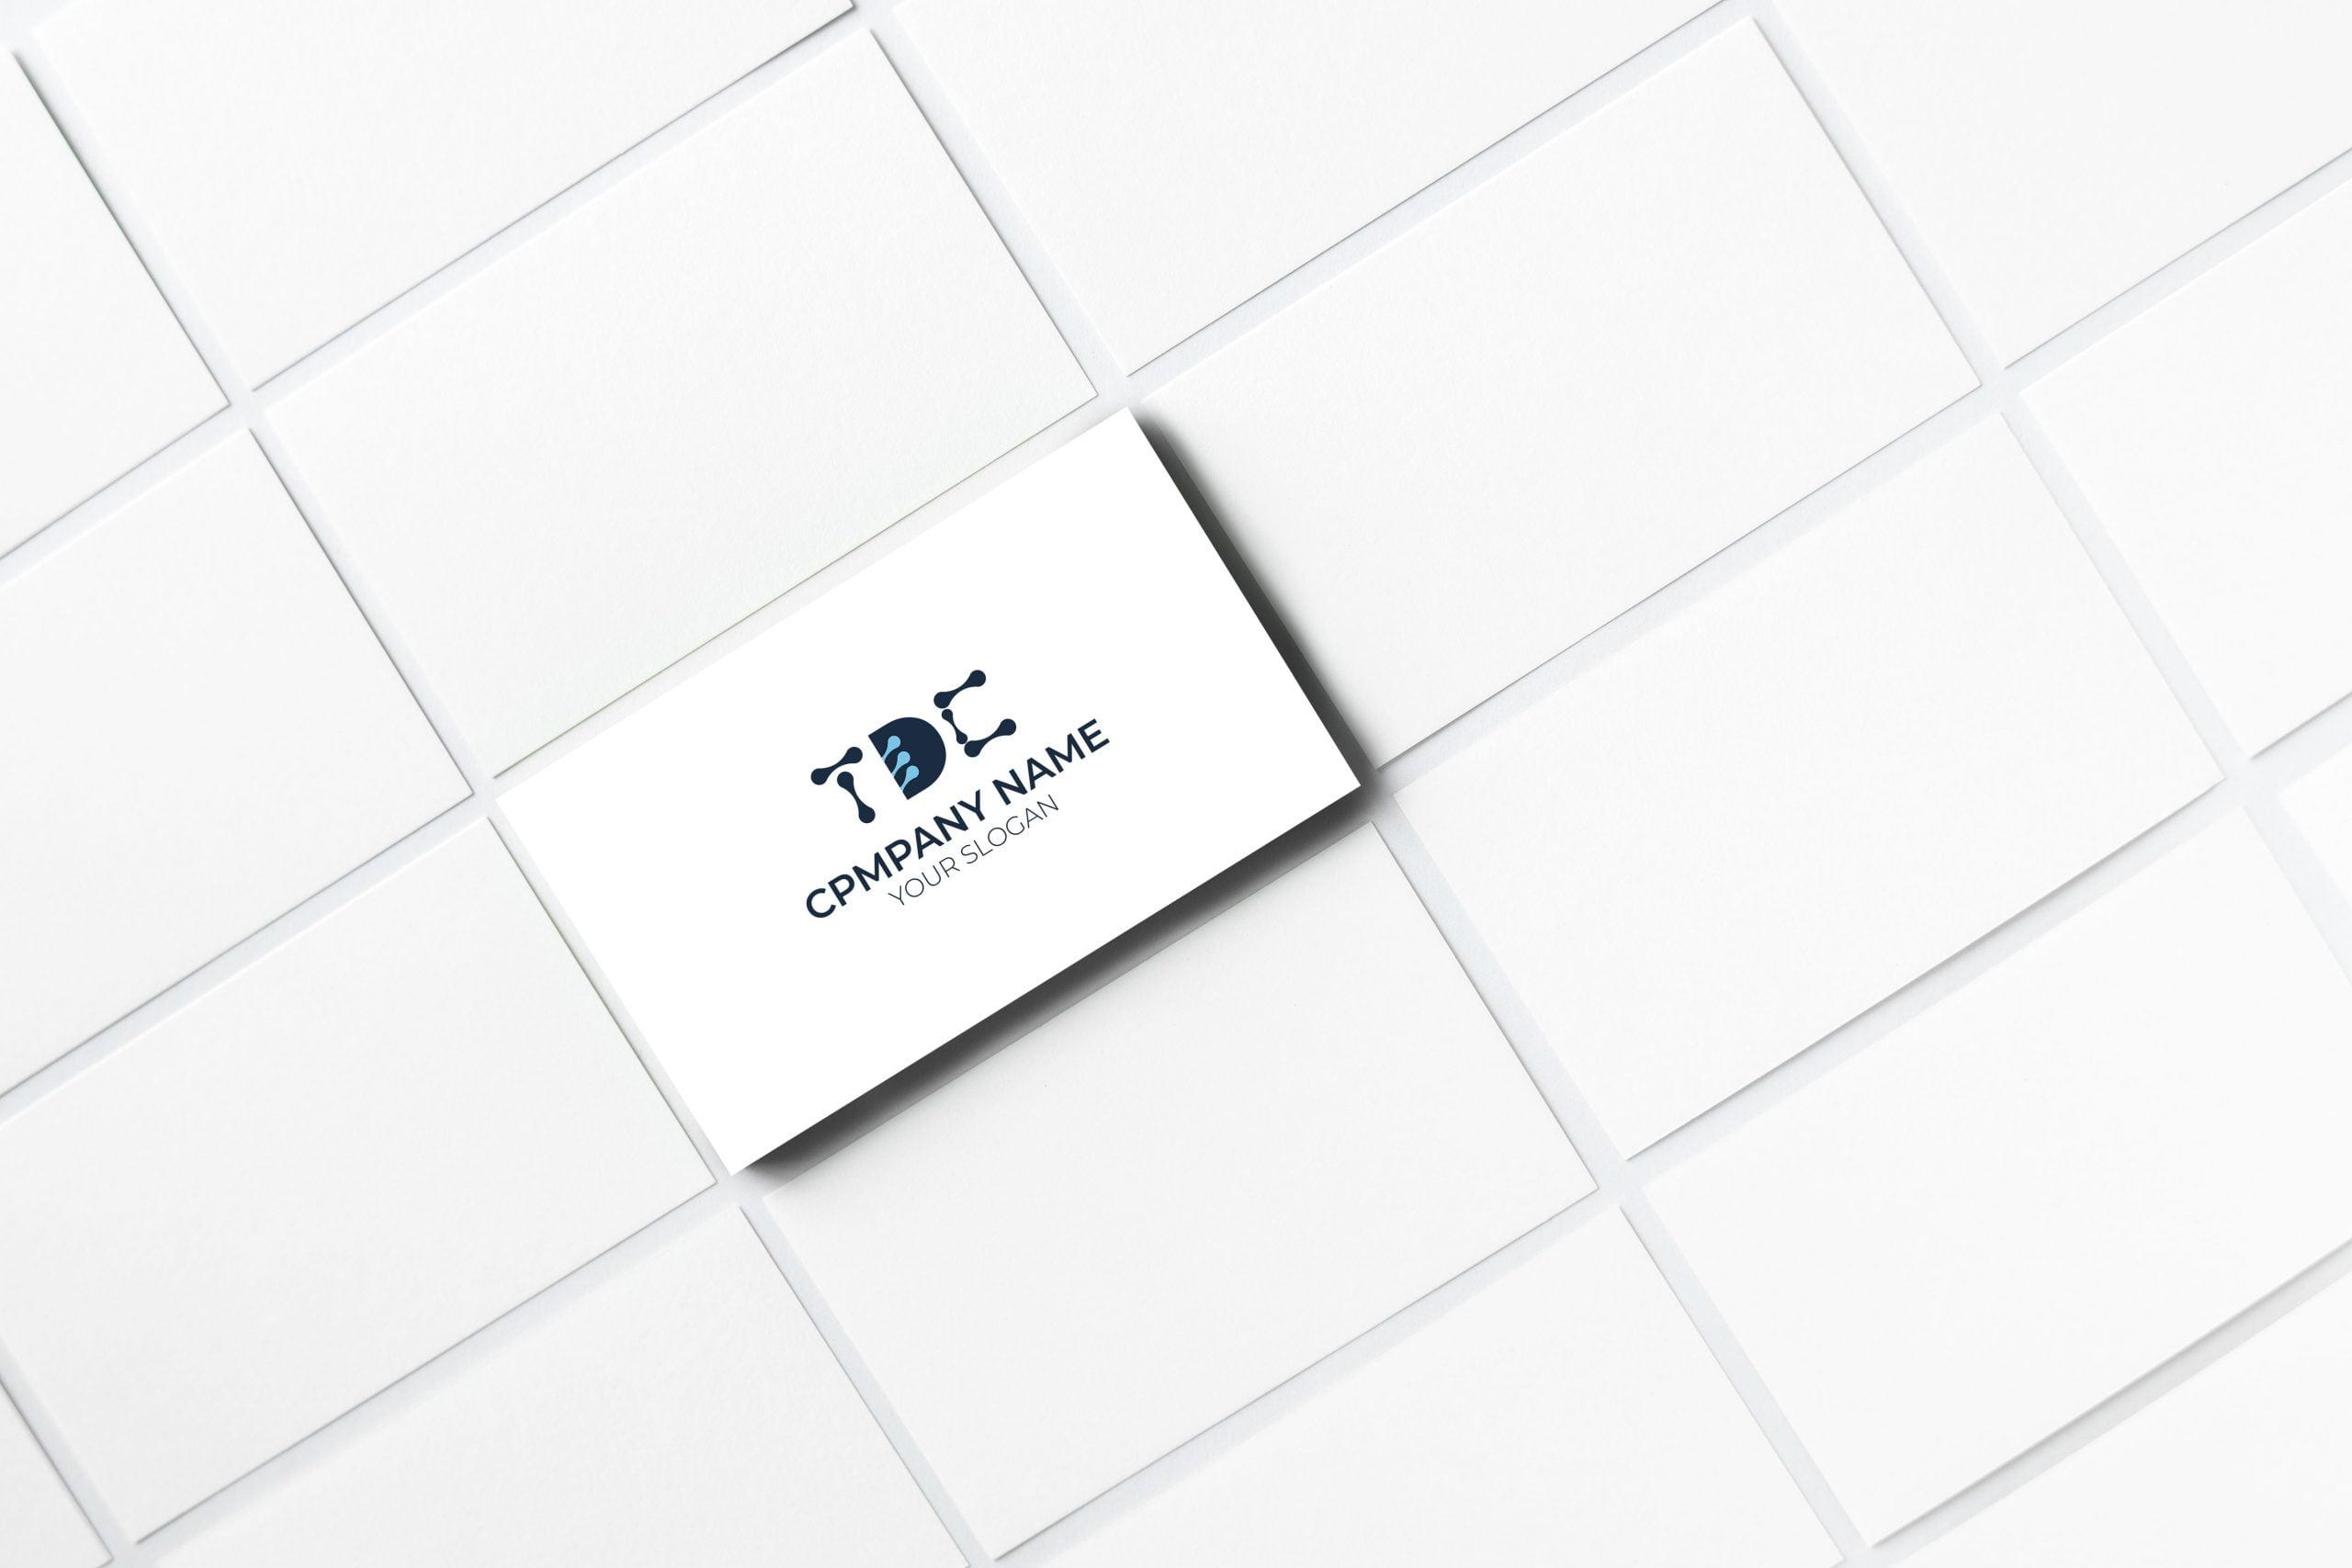 tdc tech logo on business card